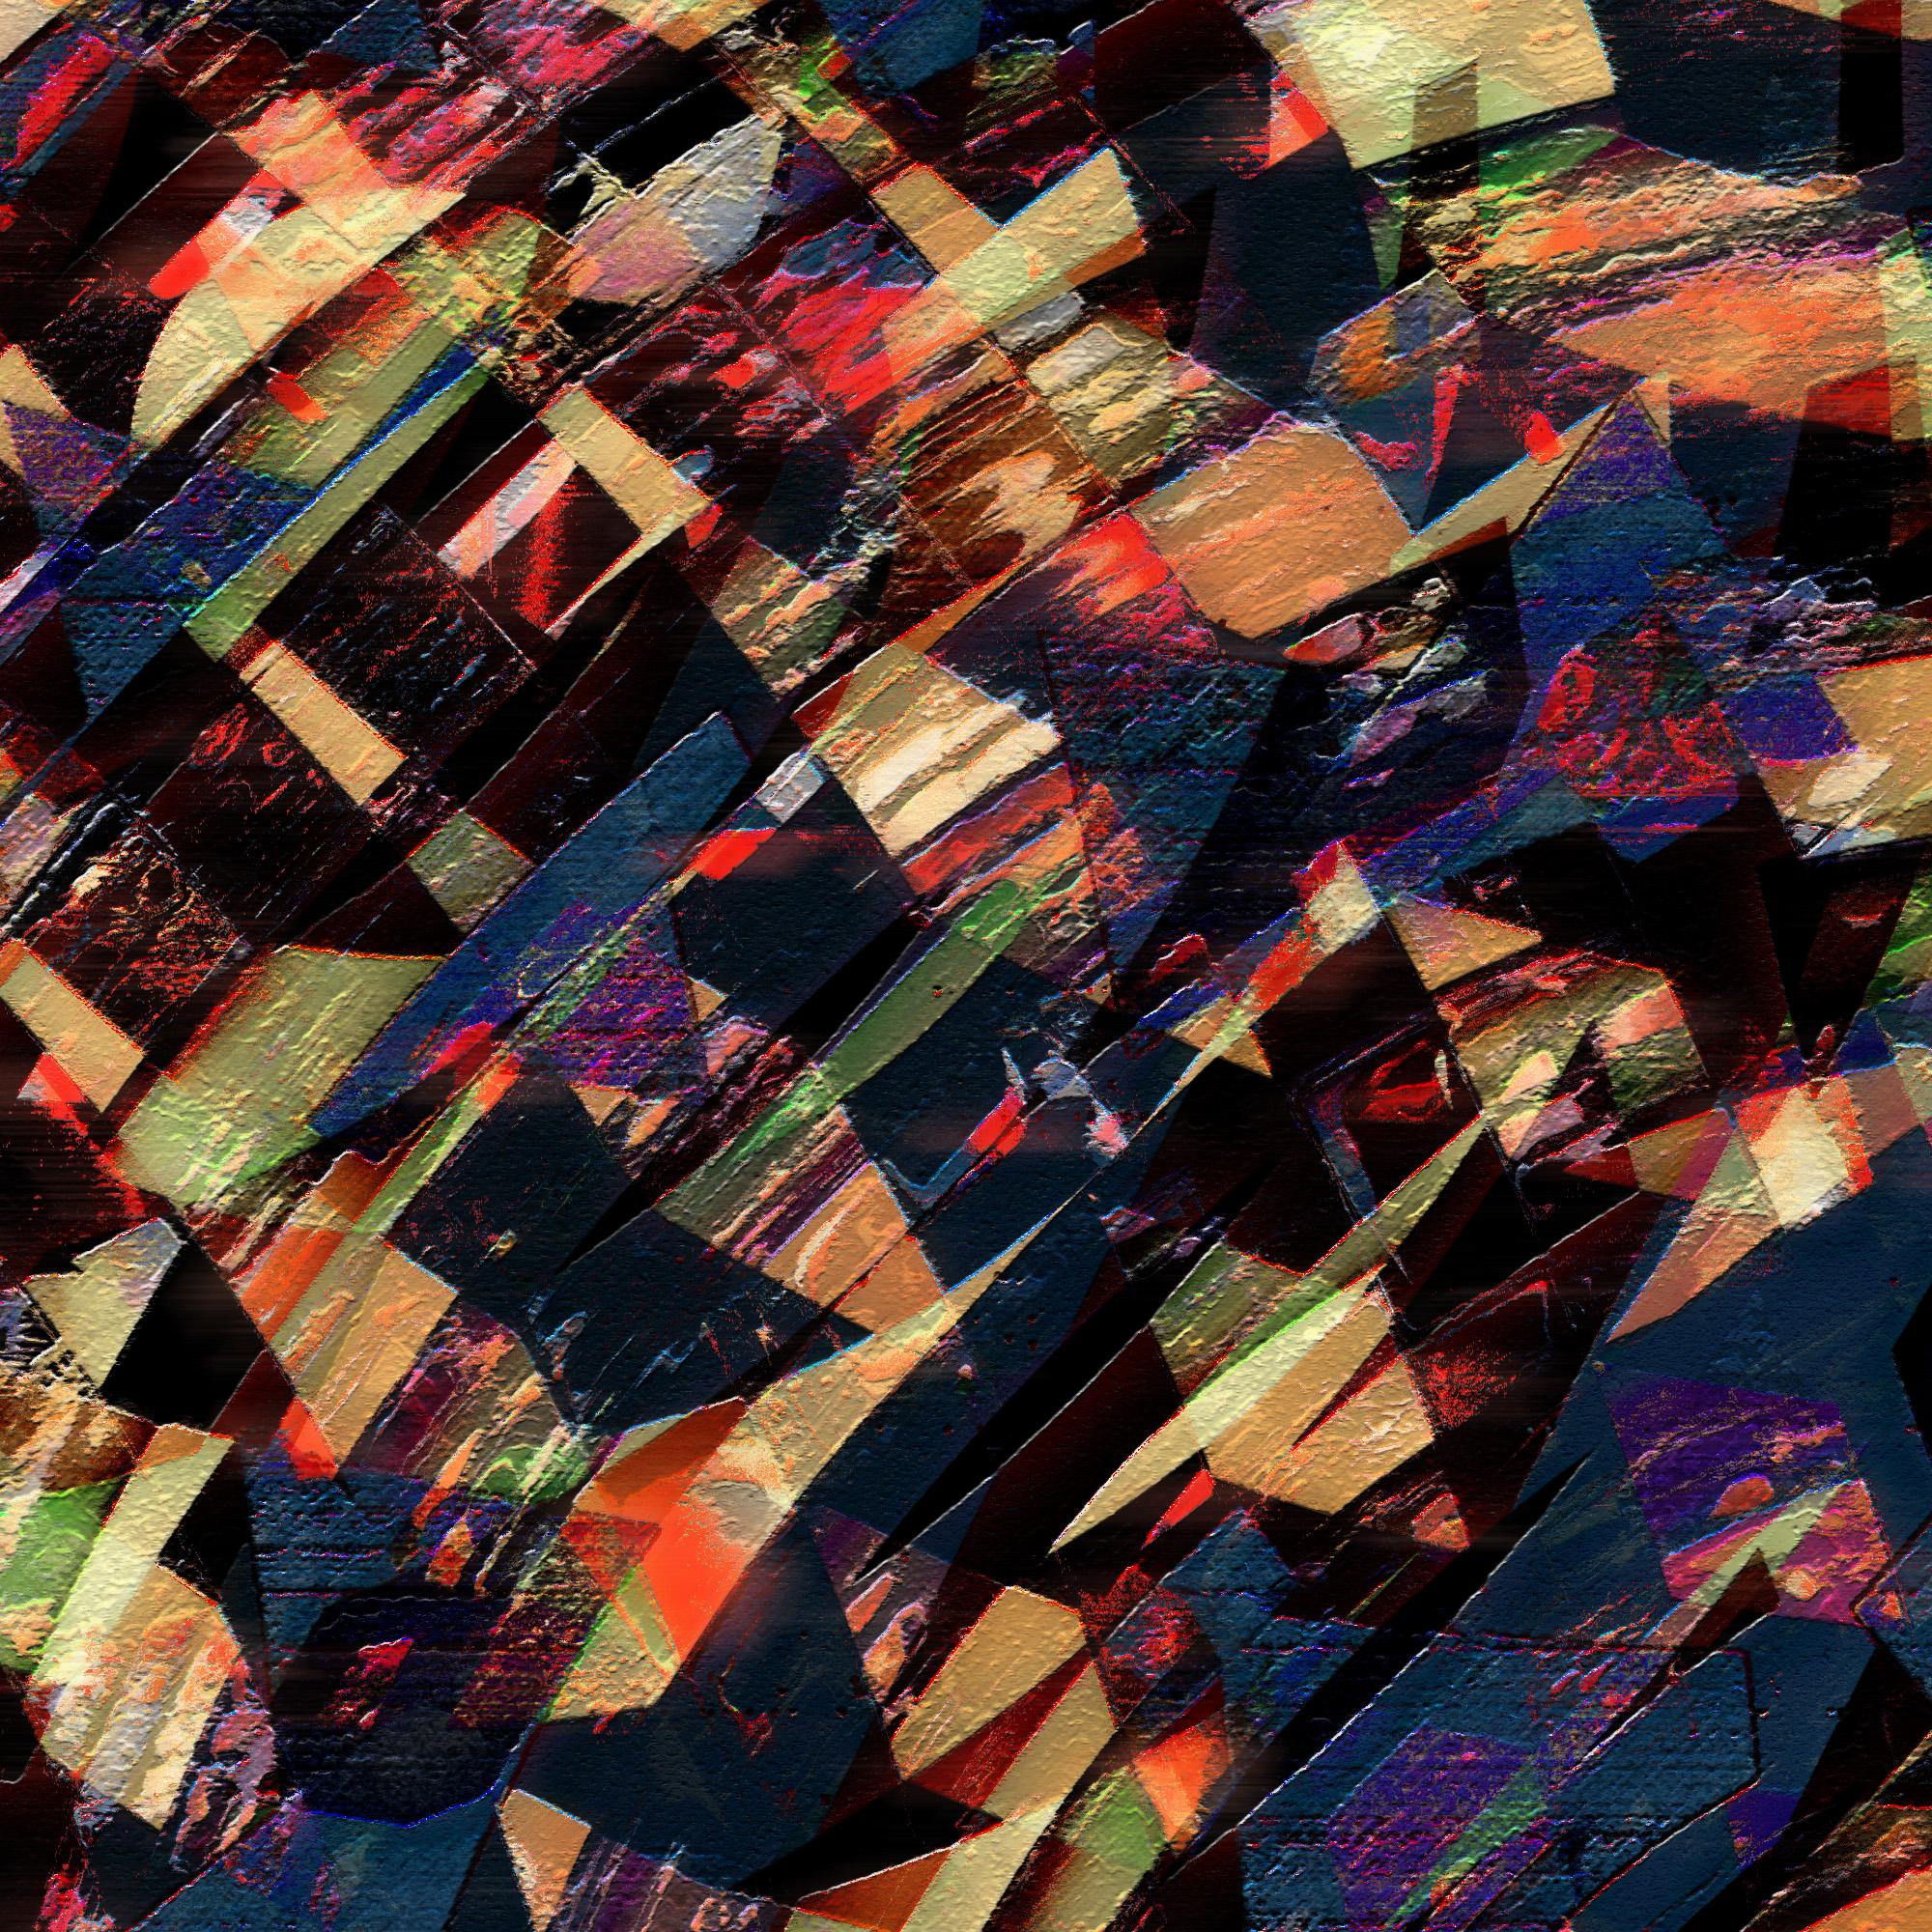 190113_Hexed_Detail4.jpg